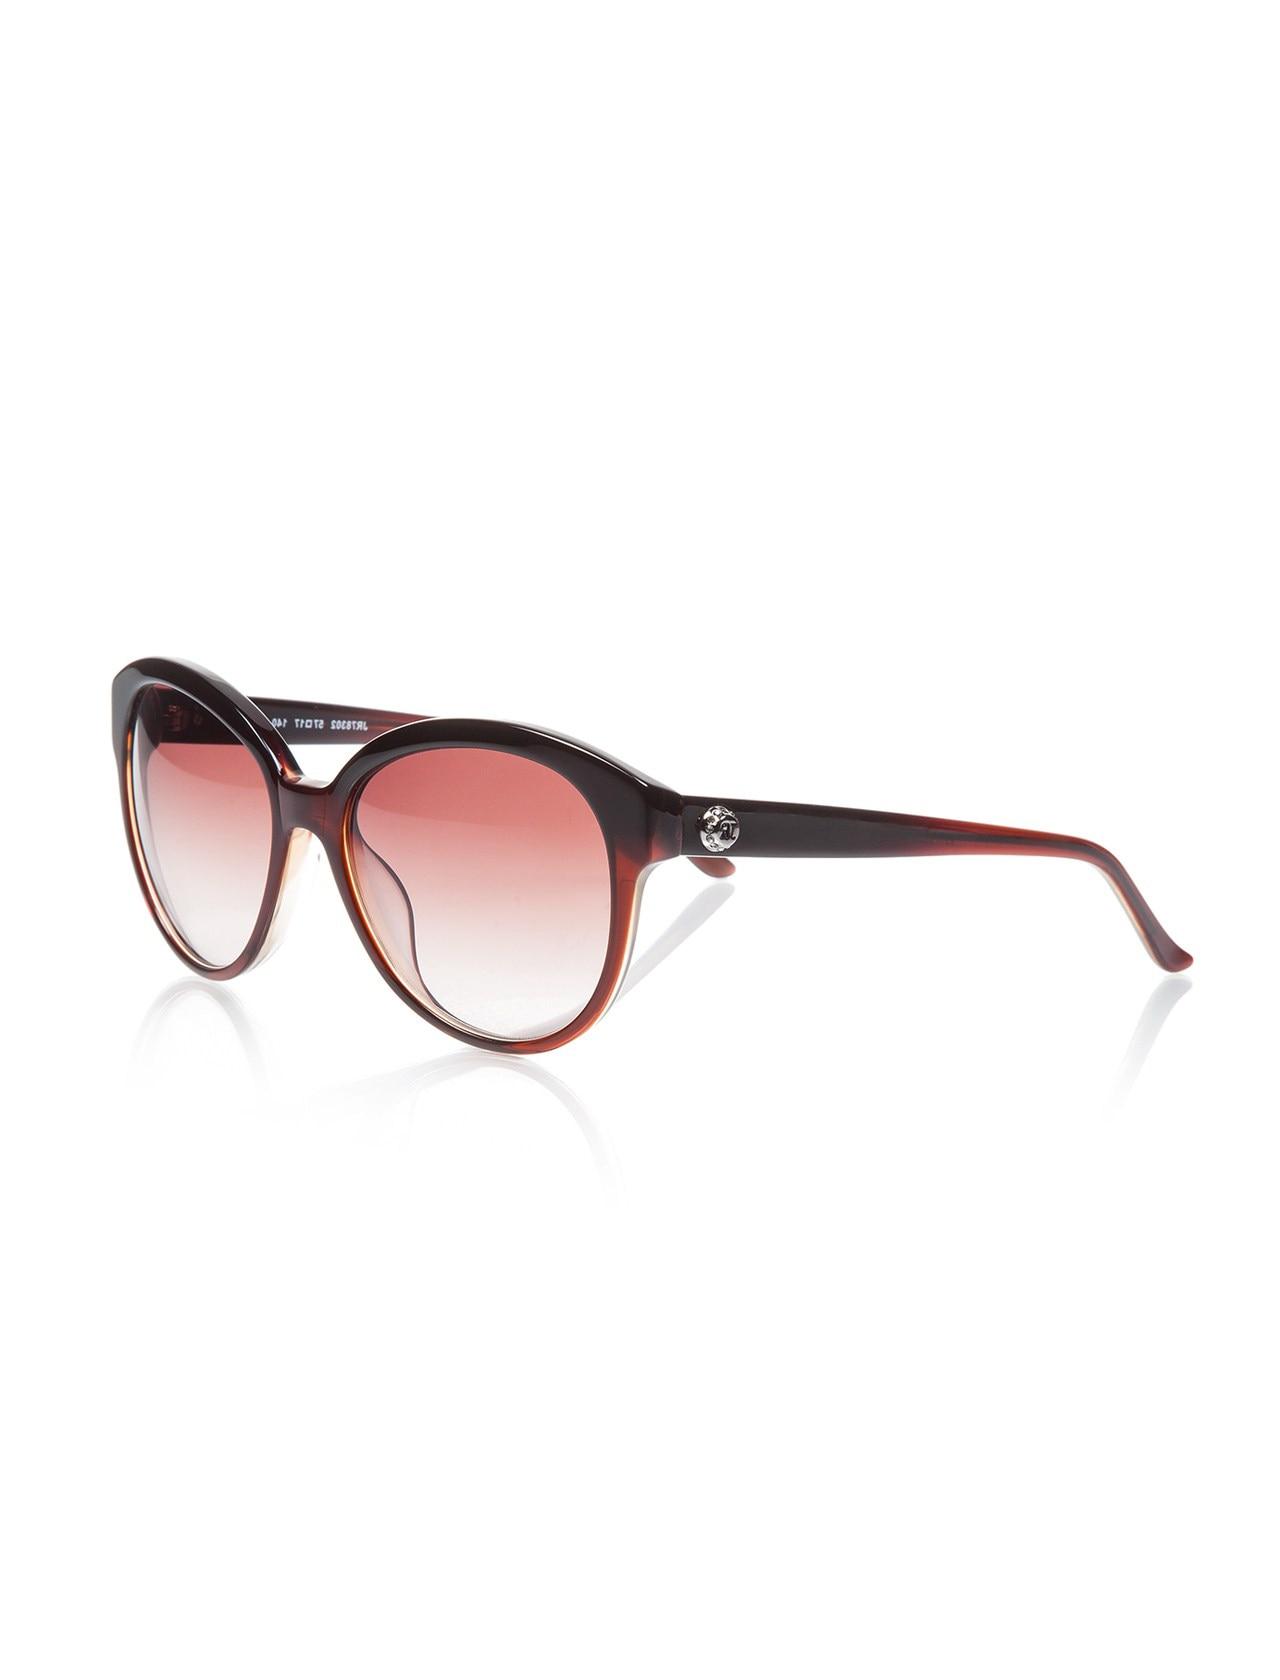 Women's sunglasses jr 783 02 57 bone Brown organic oval aval 57-17-140 john richmond